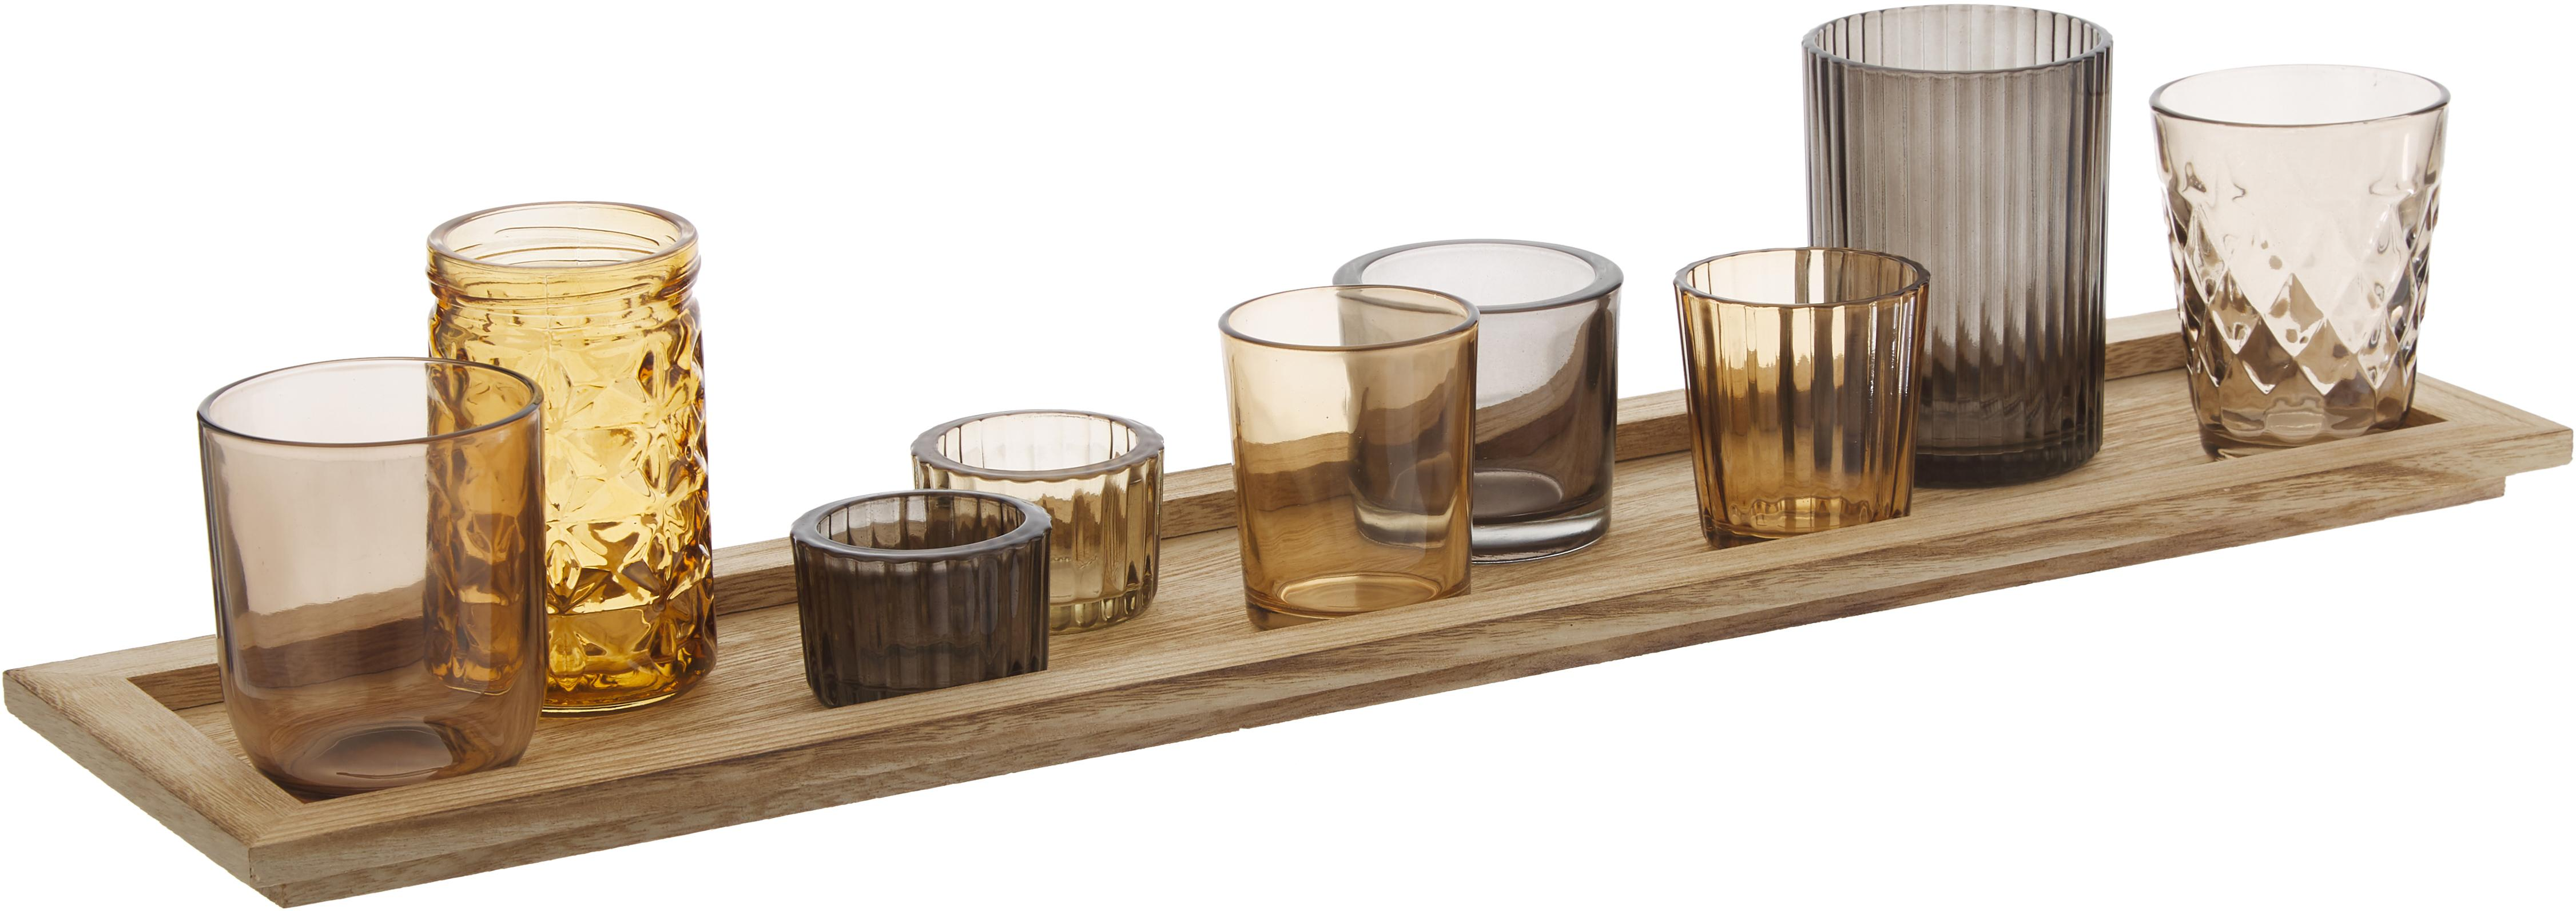 Teelichthalter-Set Wessel, 10-tlg., Tablett: Paulowniaholz, Brauntöne, 56 x 10 cm